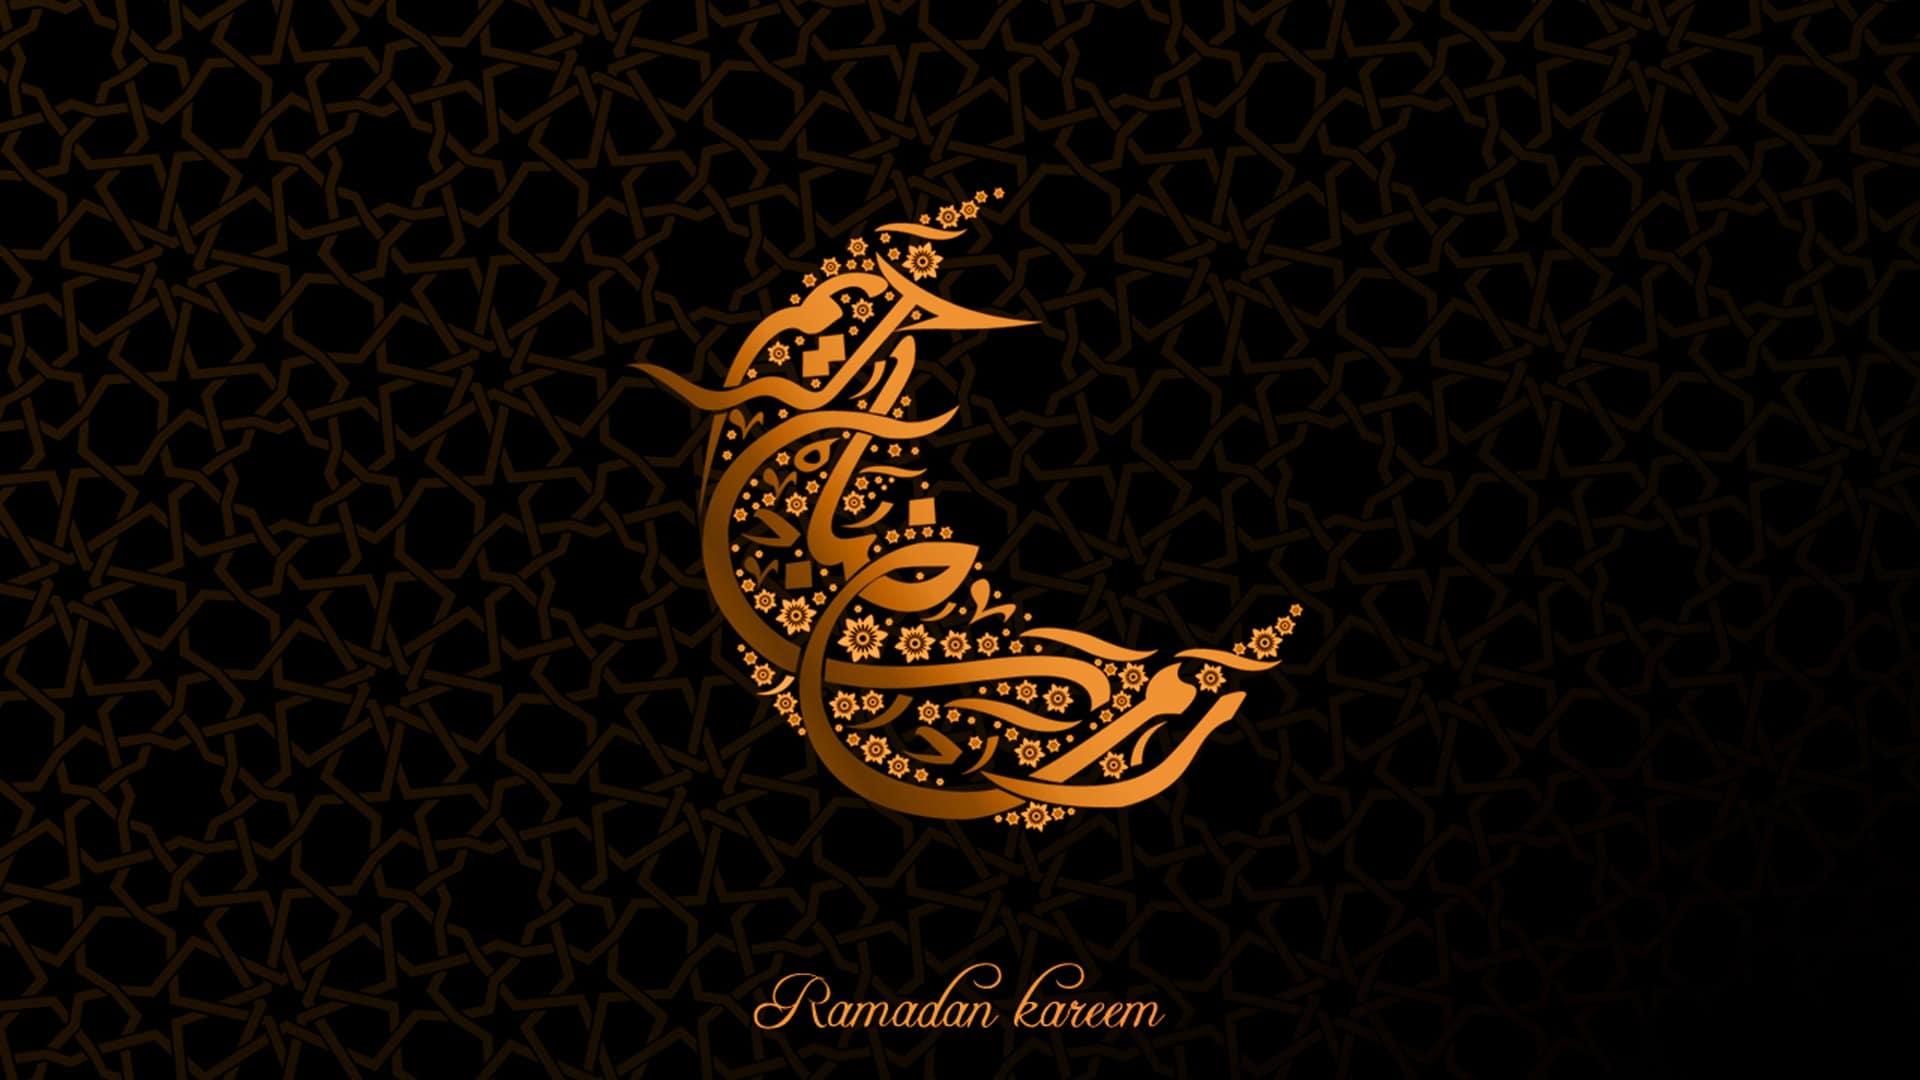 Ramadan Kareem Wishes